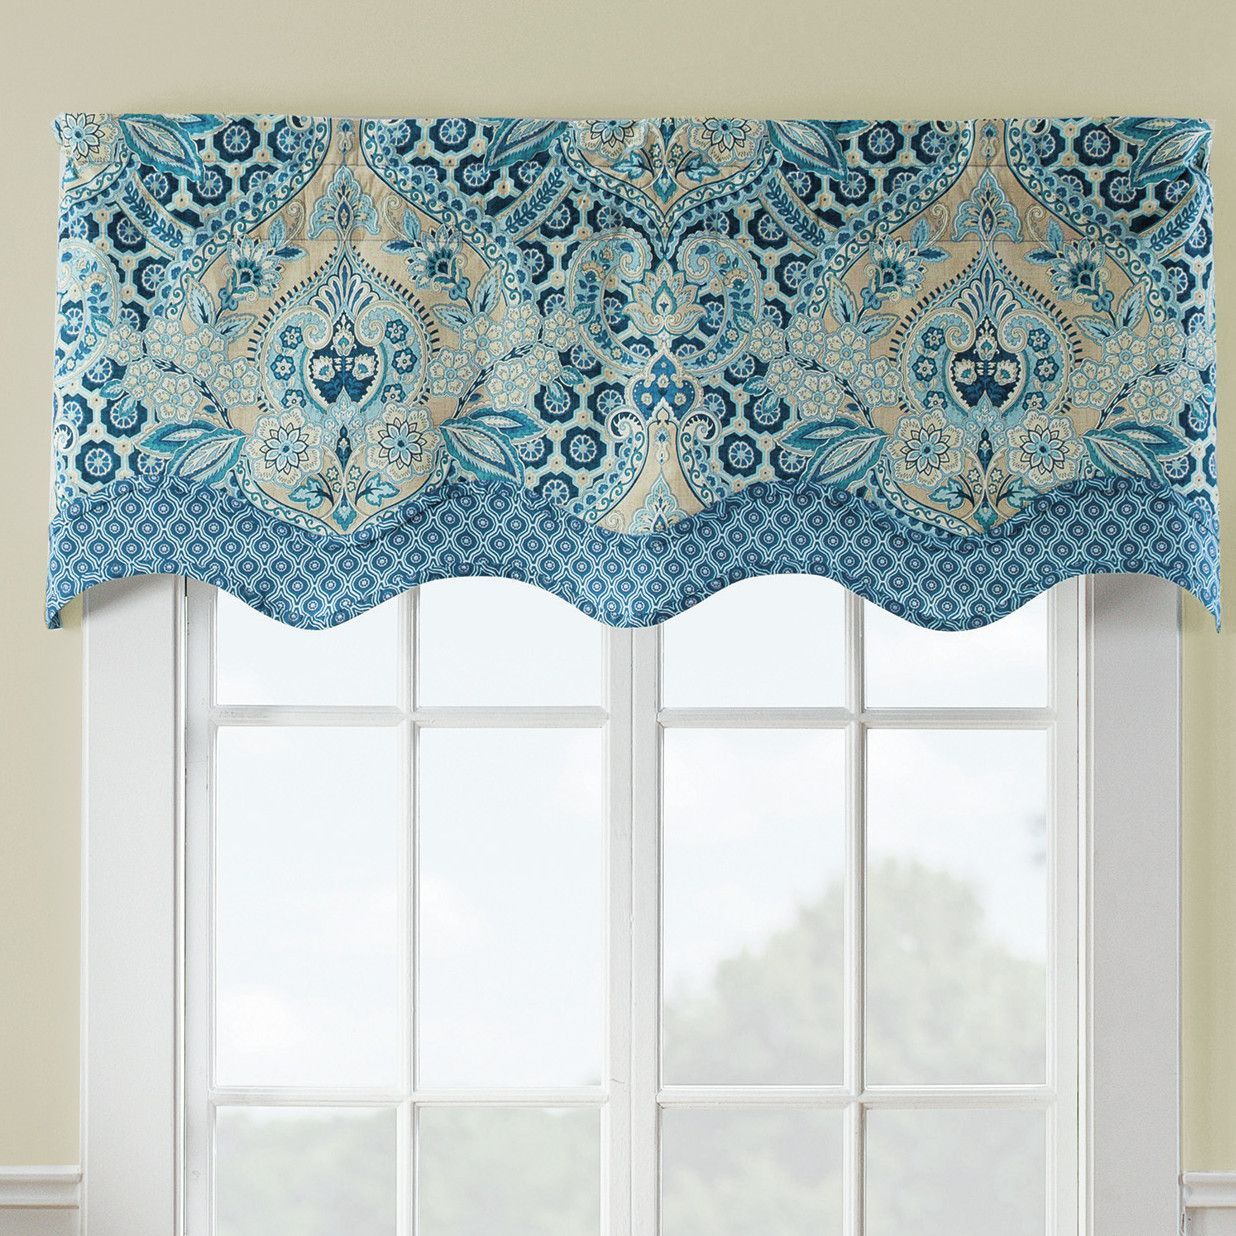 Moonlit Shadows Wave Window Curtain Valance | Curtain valances ...